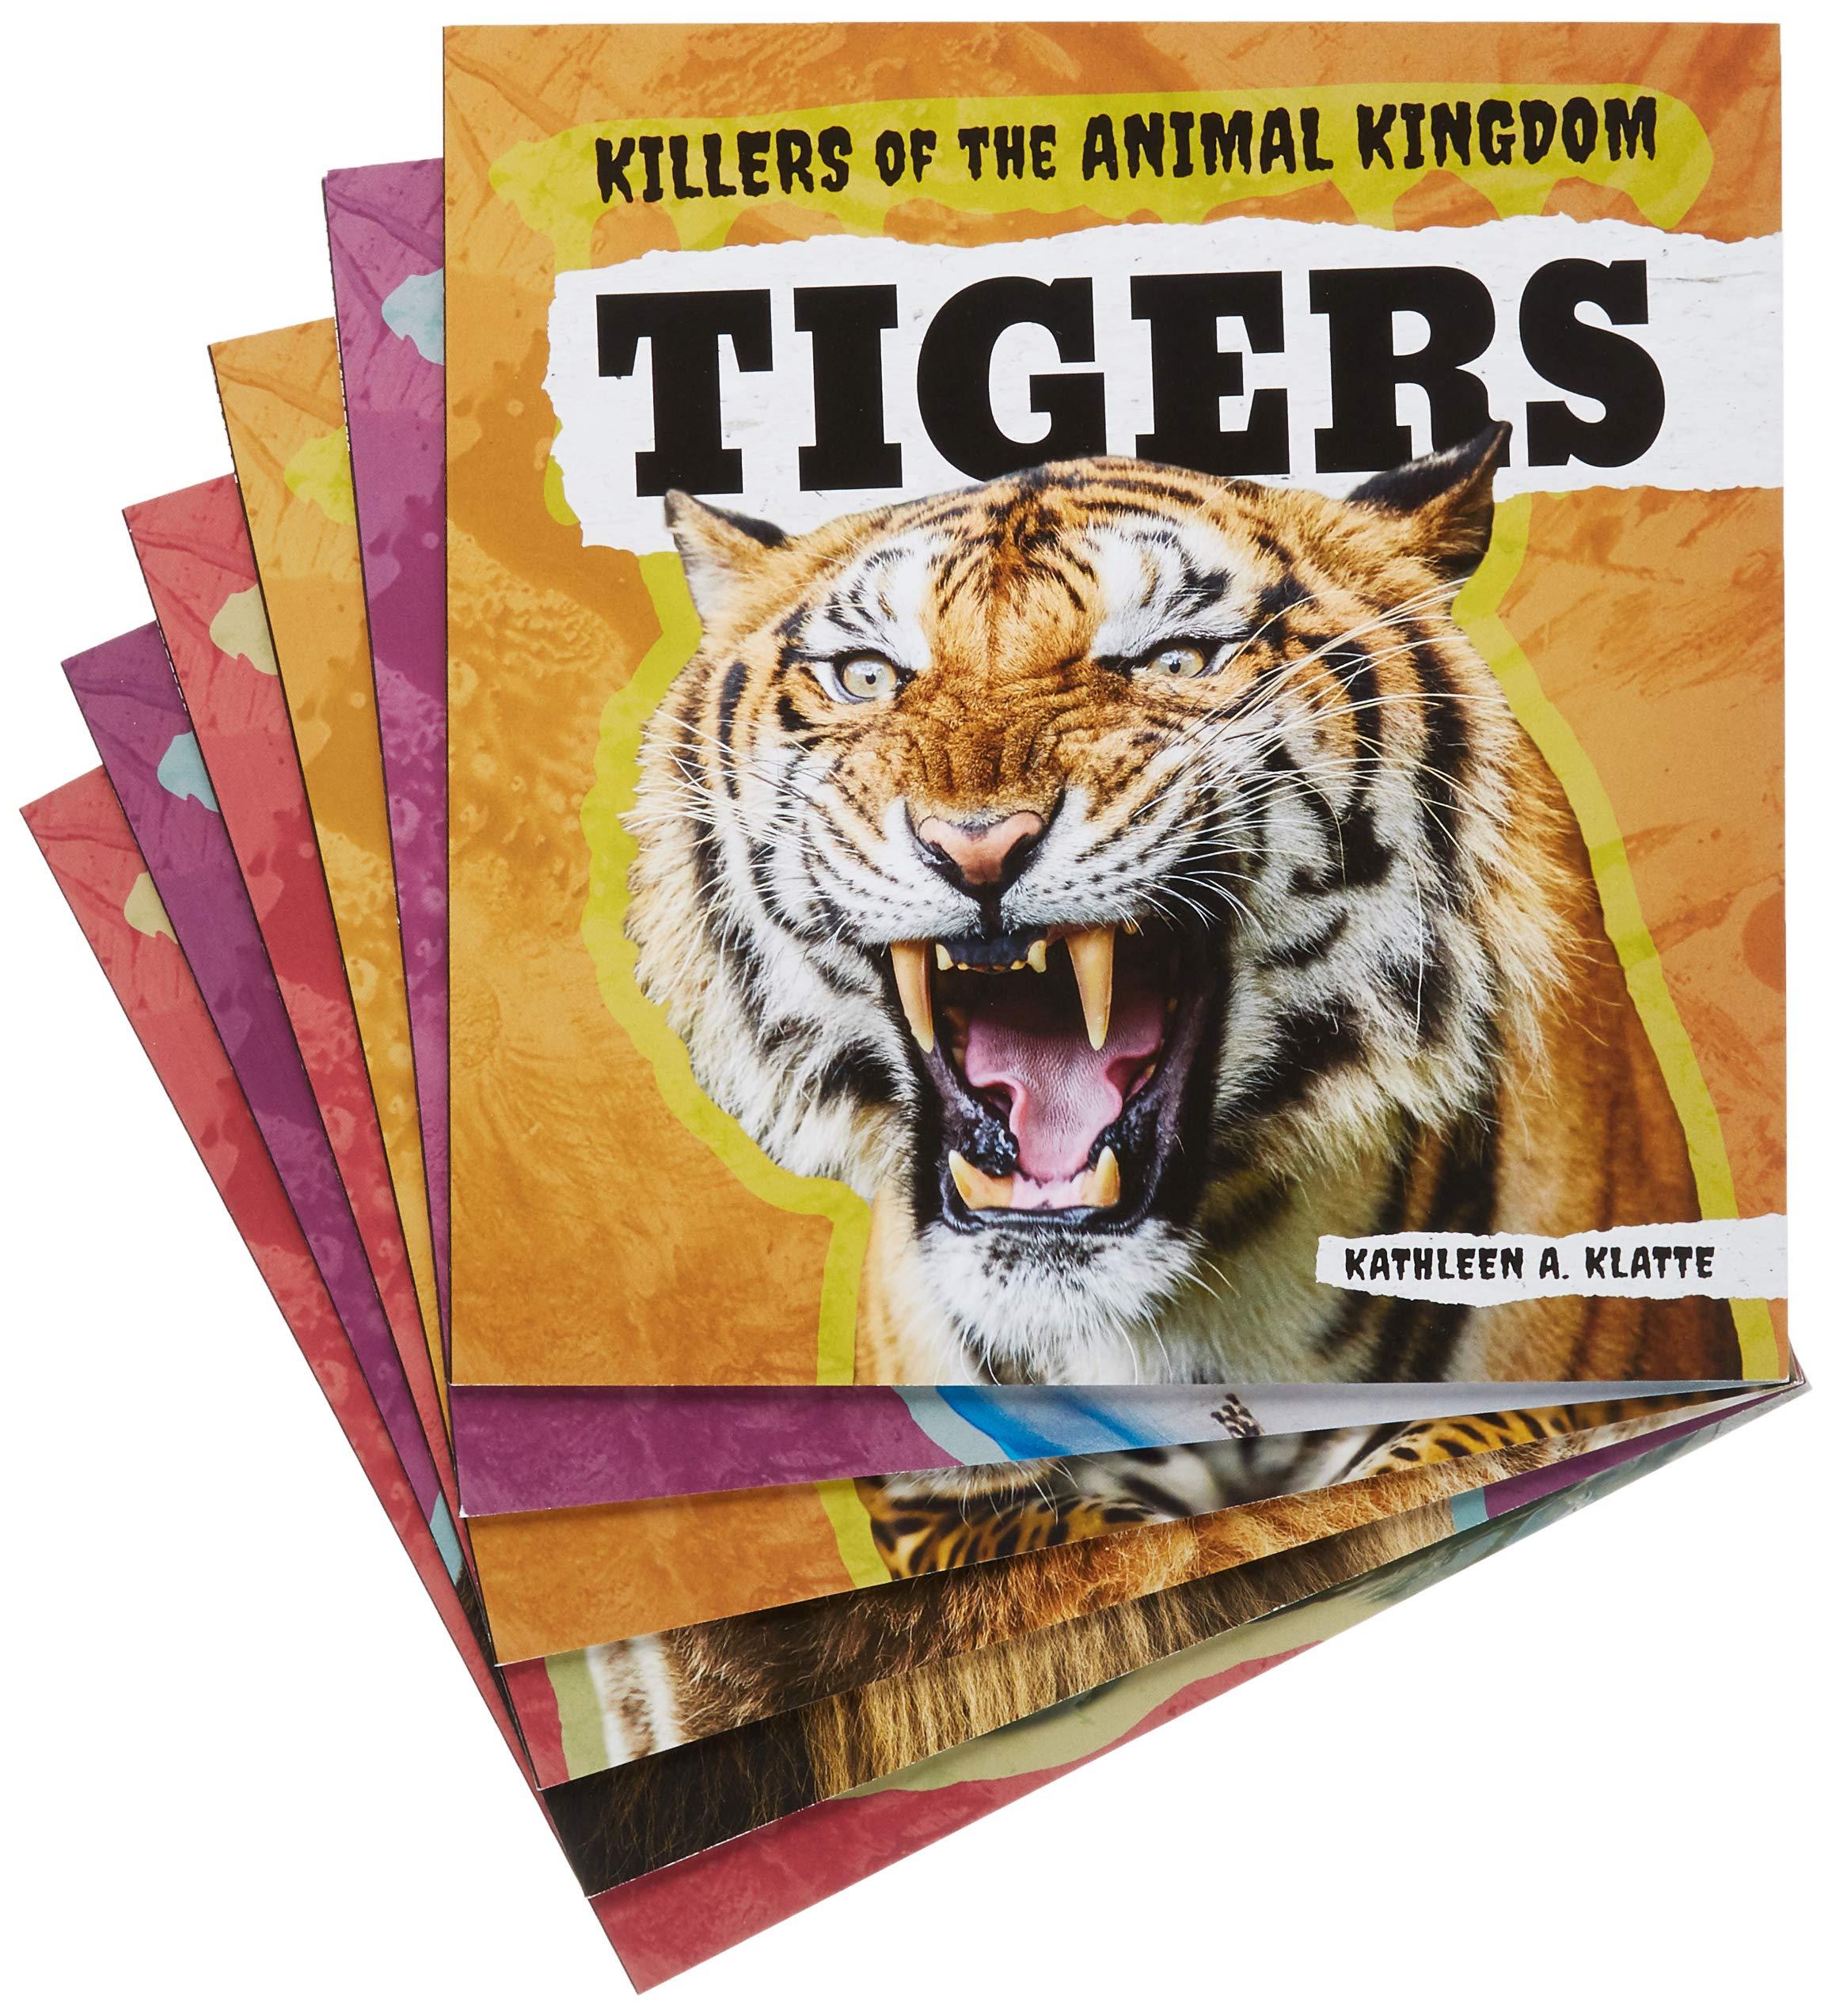 Killers of the Animal Kingdom